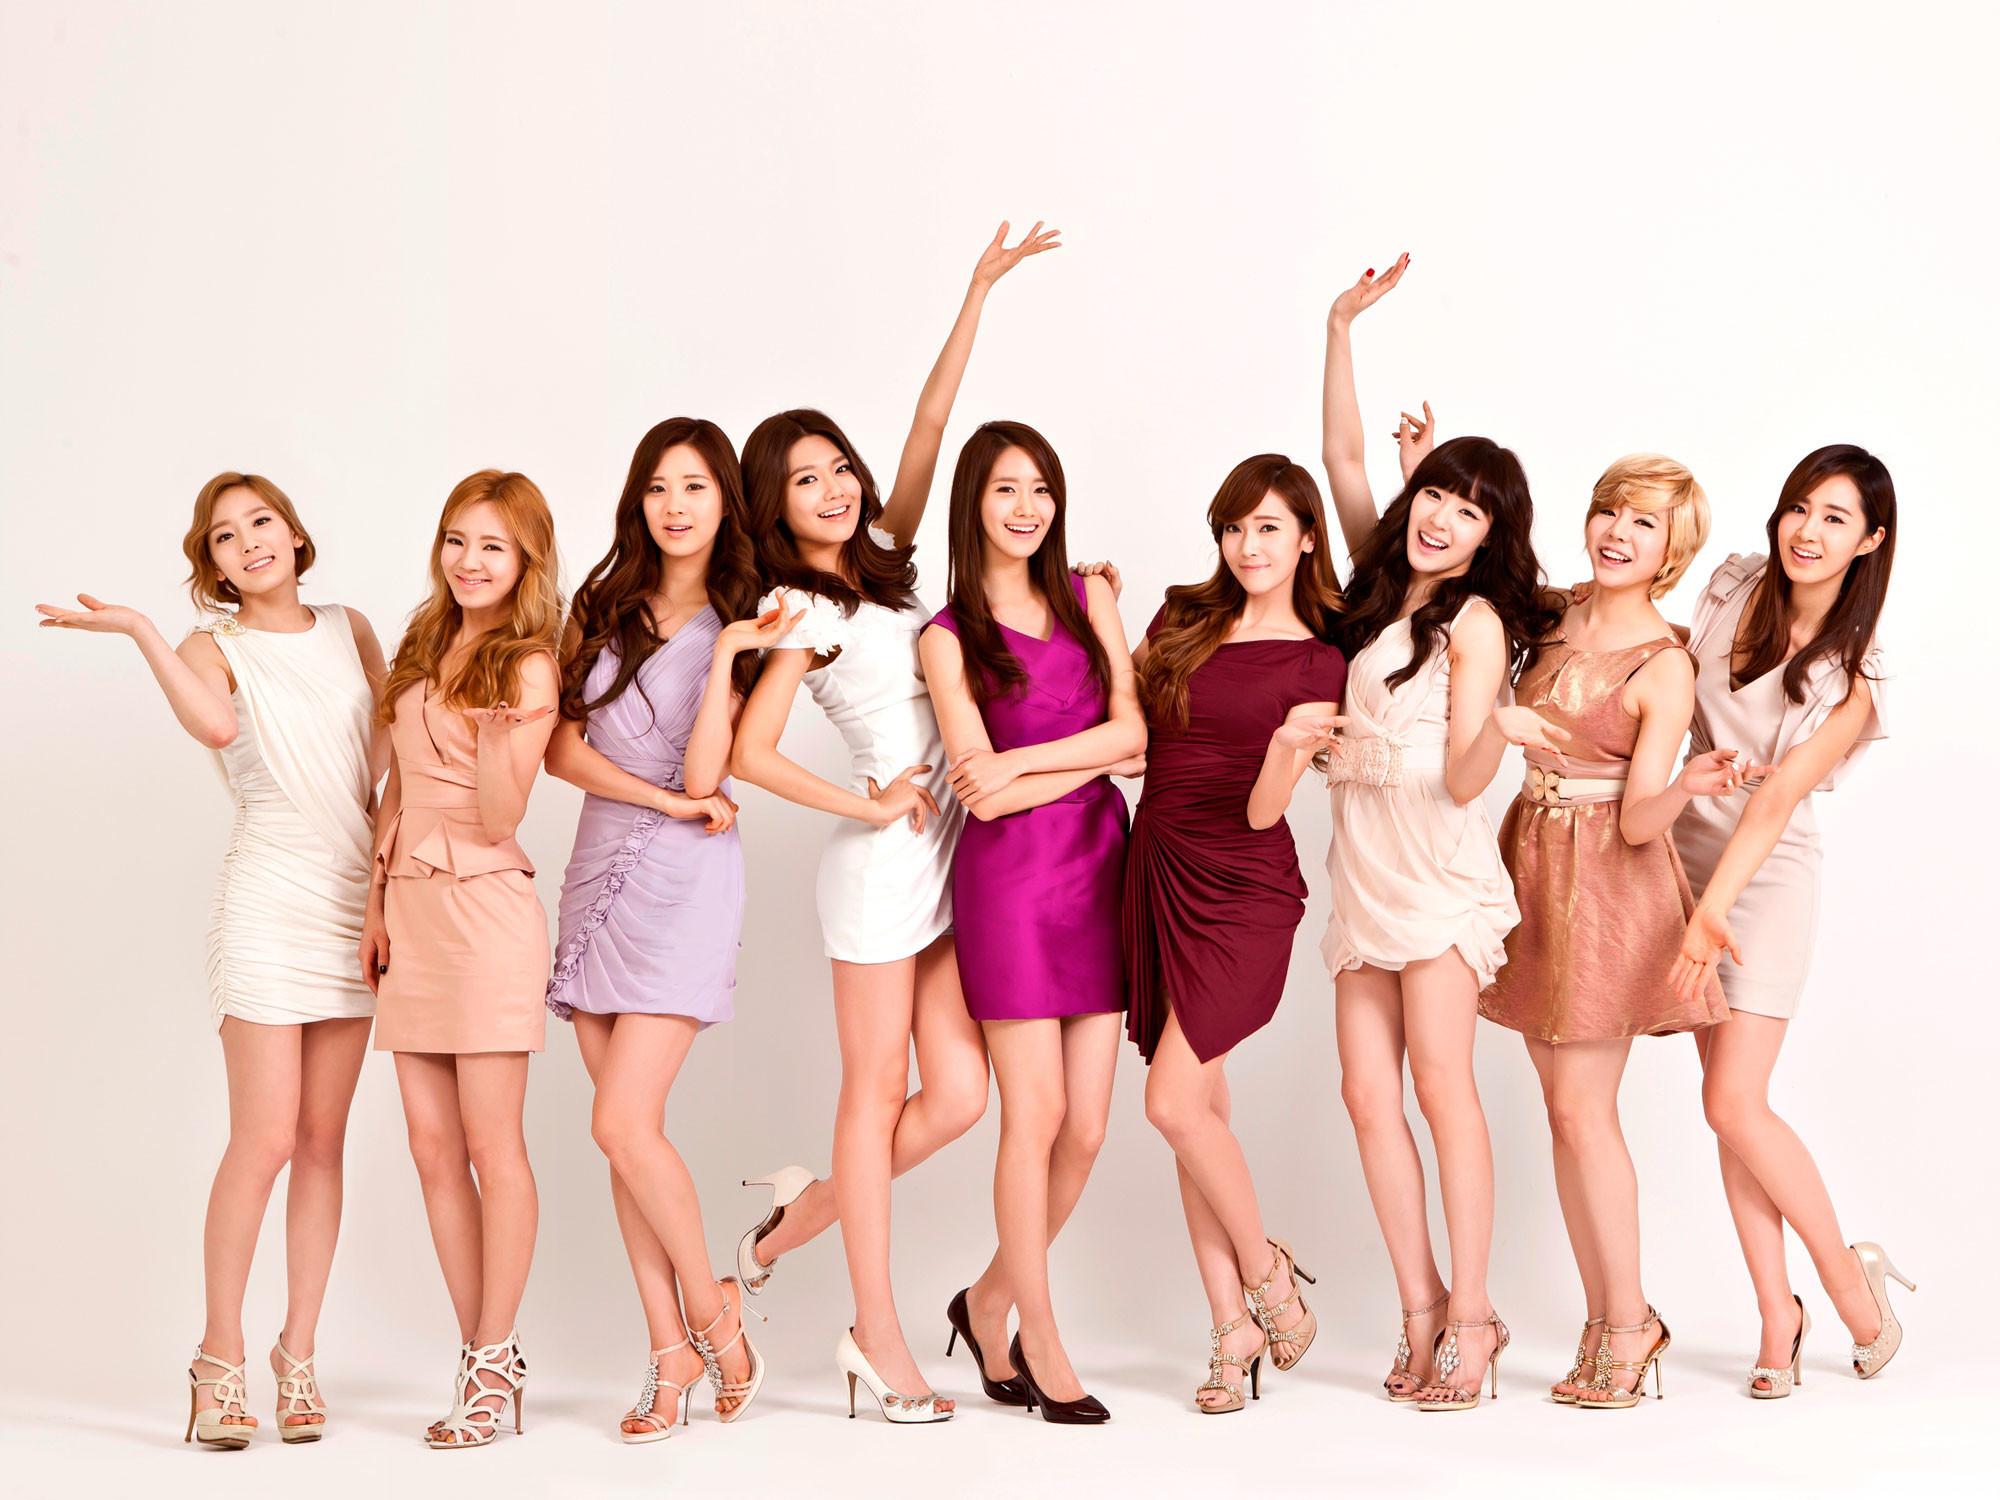 SNSD HD Wallpaper Girls Generation 9 – https://www.3amies.com